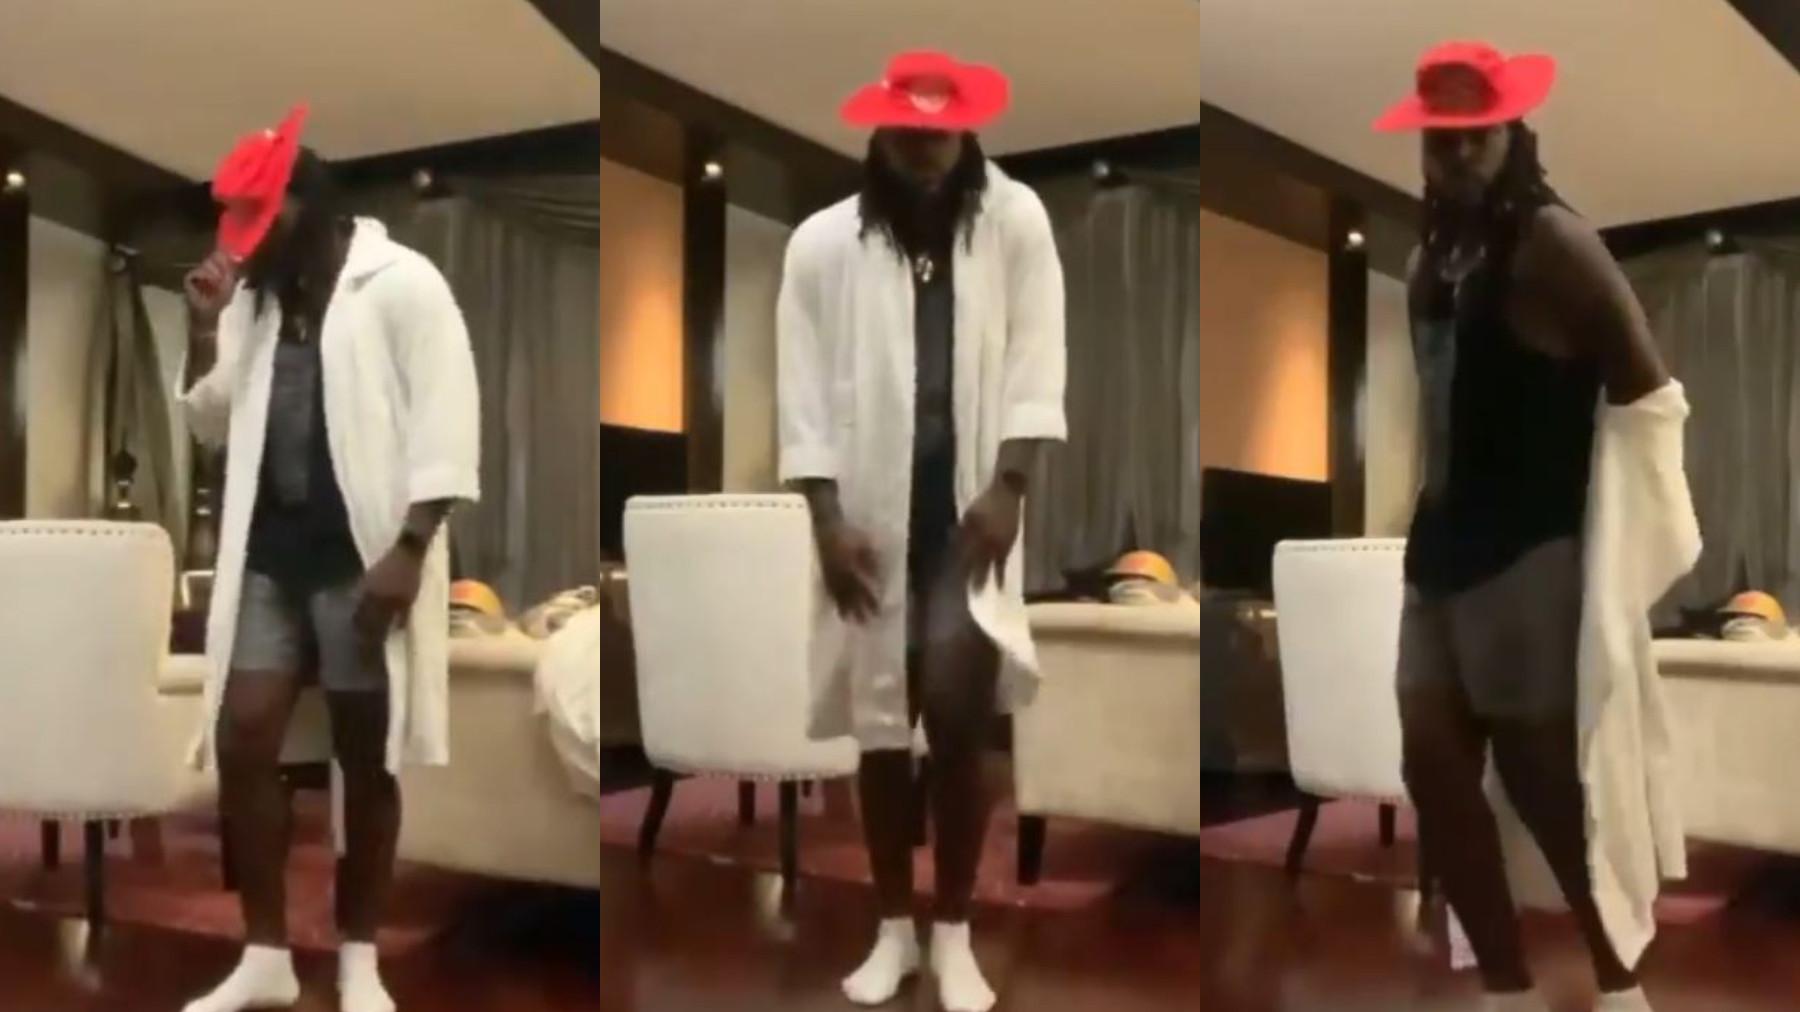 IPL 2021: WATCH- PBKS' Chris Gayle celebrates the end of his quarantine with a 'moonwalk' dance